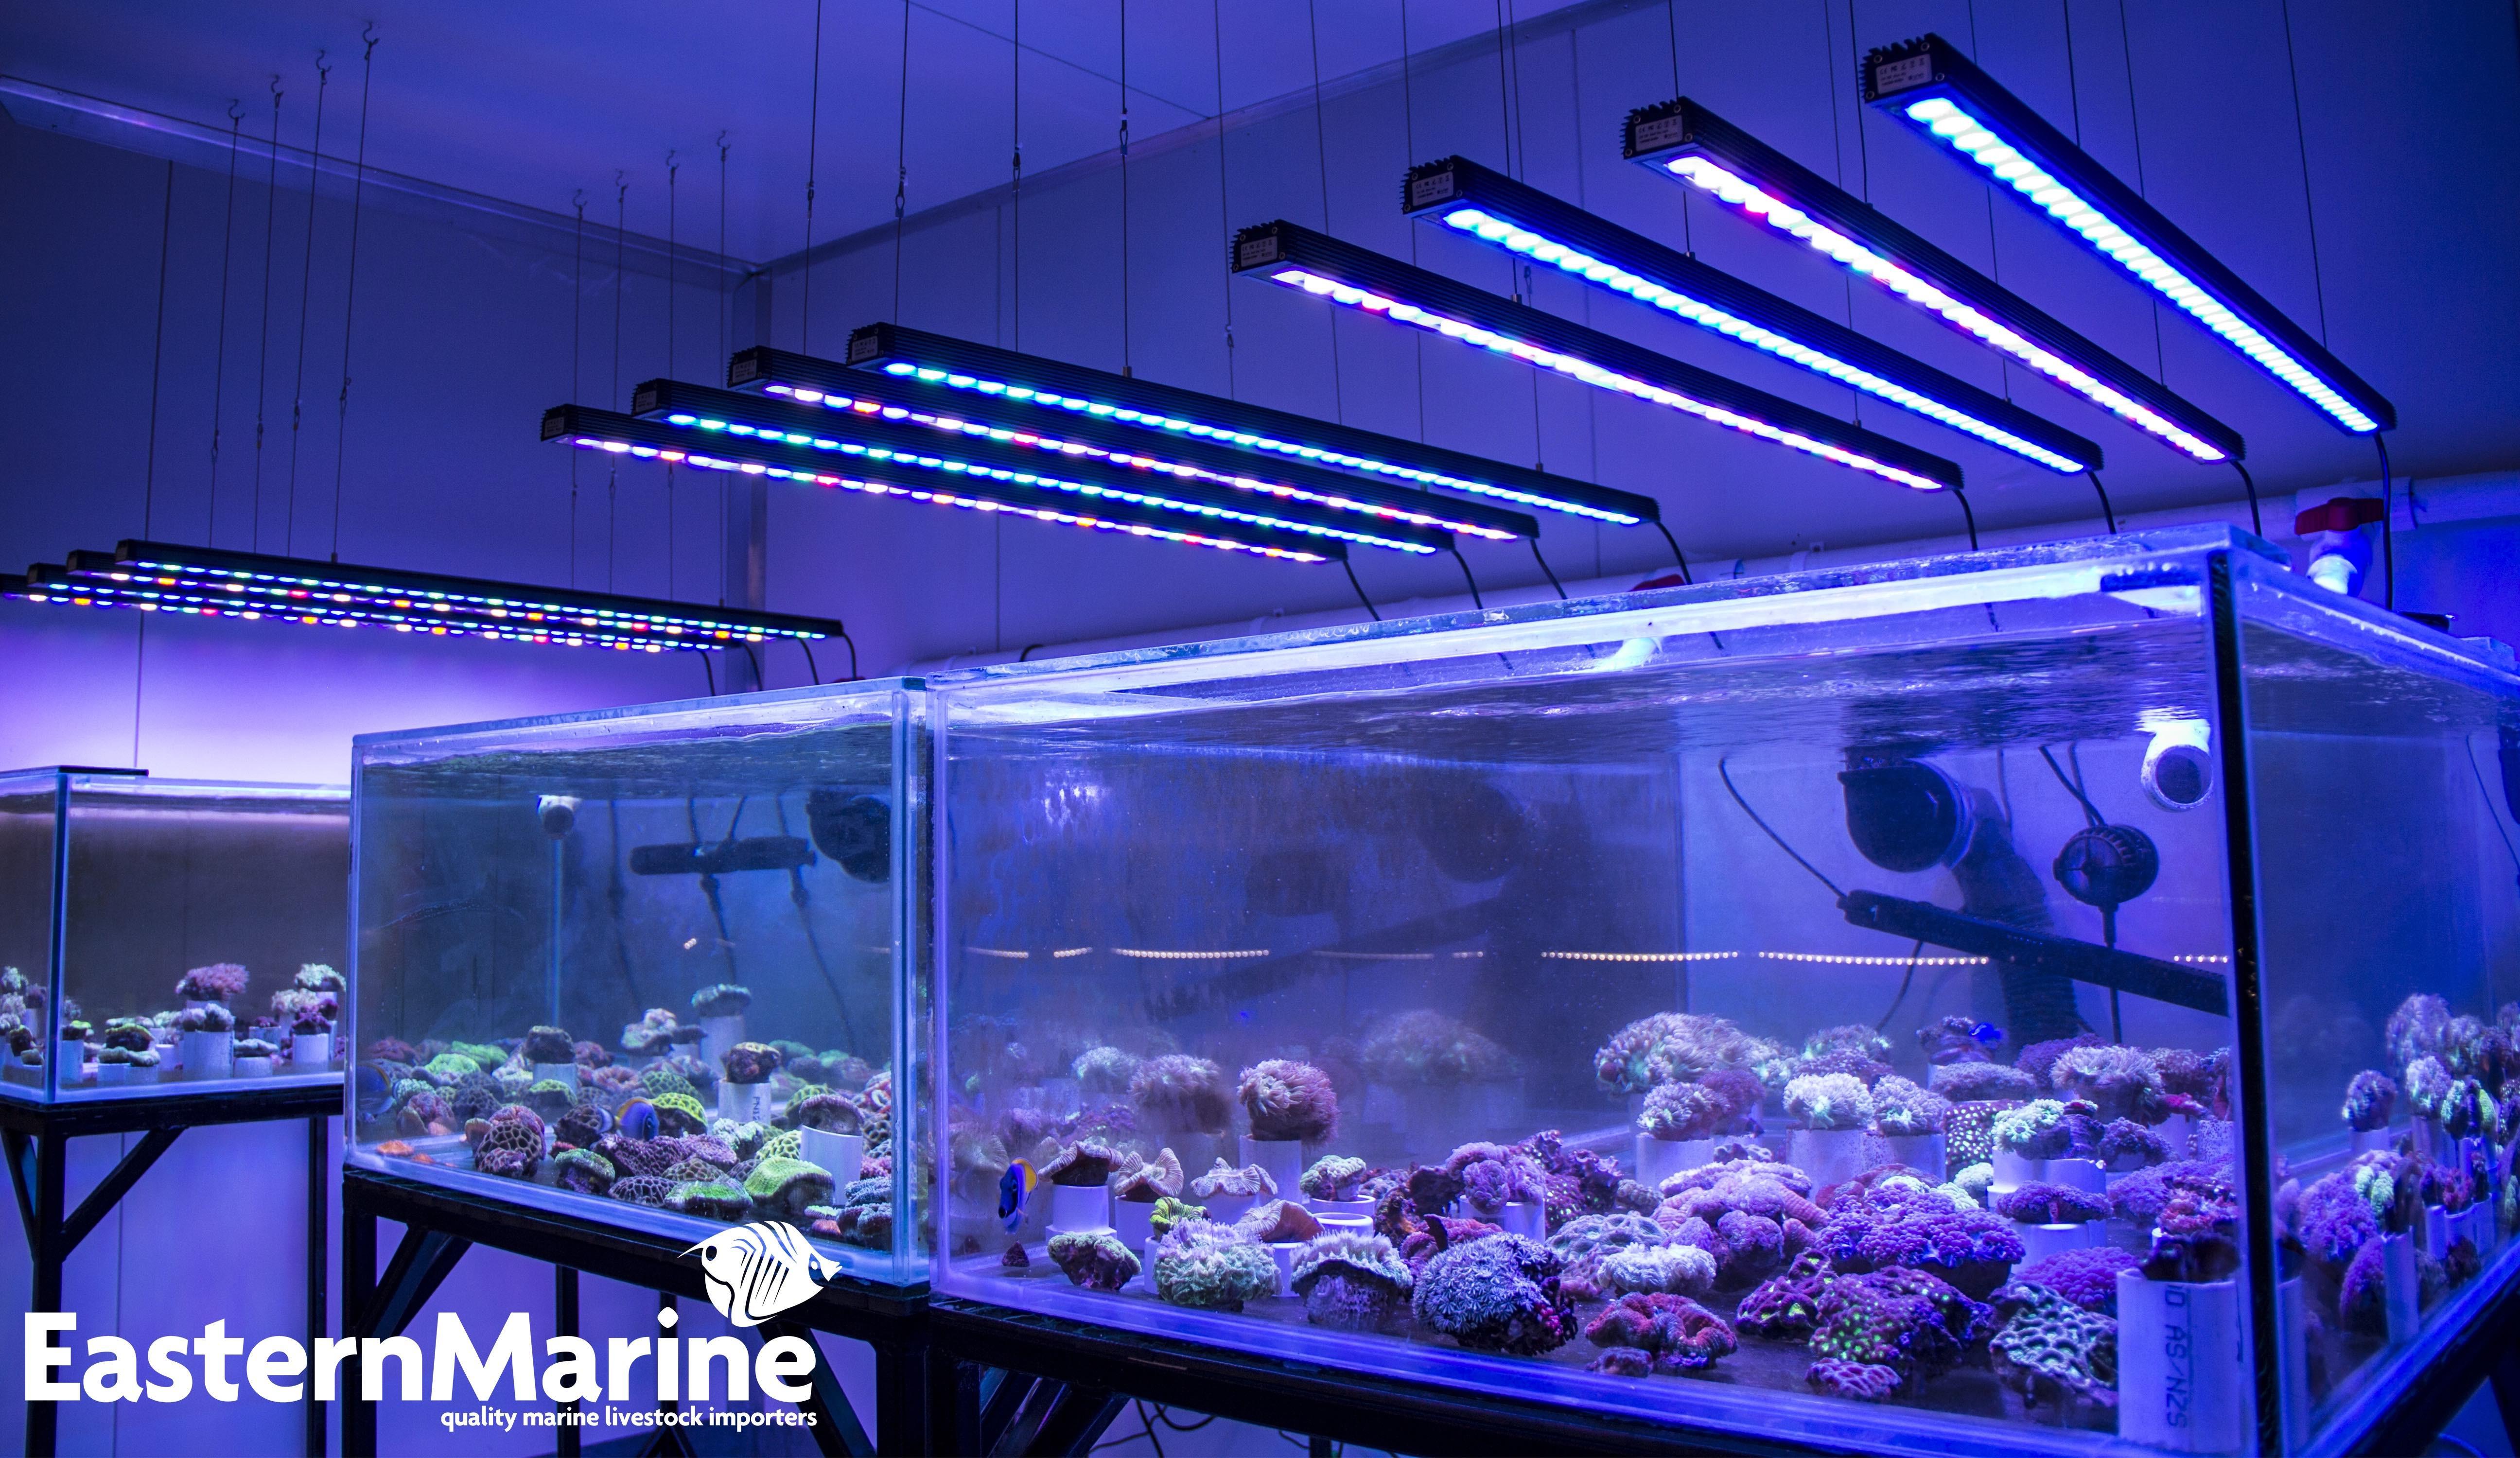 Best ideas about Led Aquarium Lights . Save or Pin OR 120 90 60 BAR LED Lighting • Orphek Aquarium LED Lighting Now.